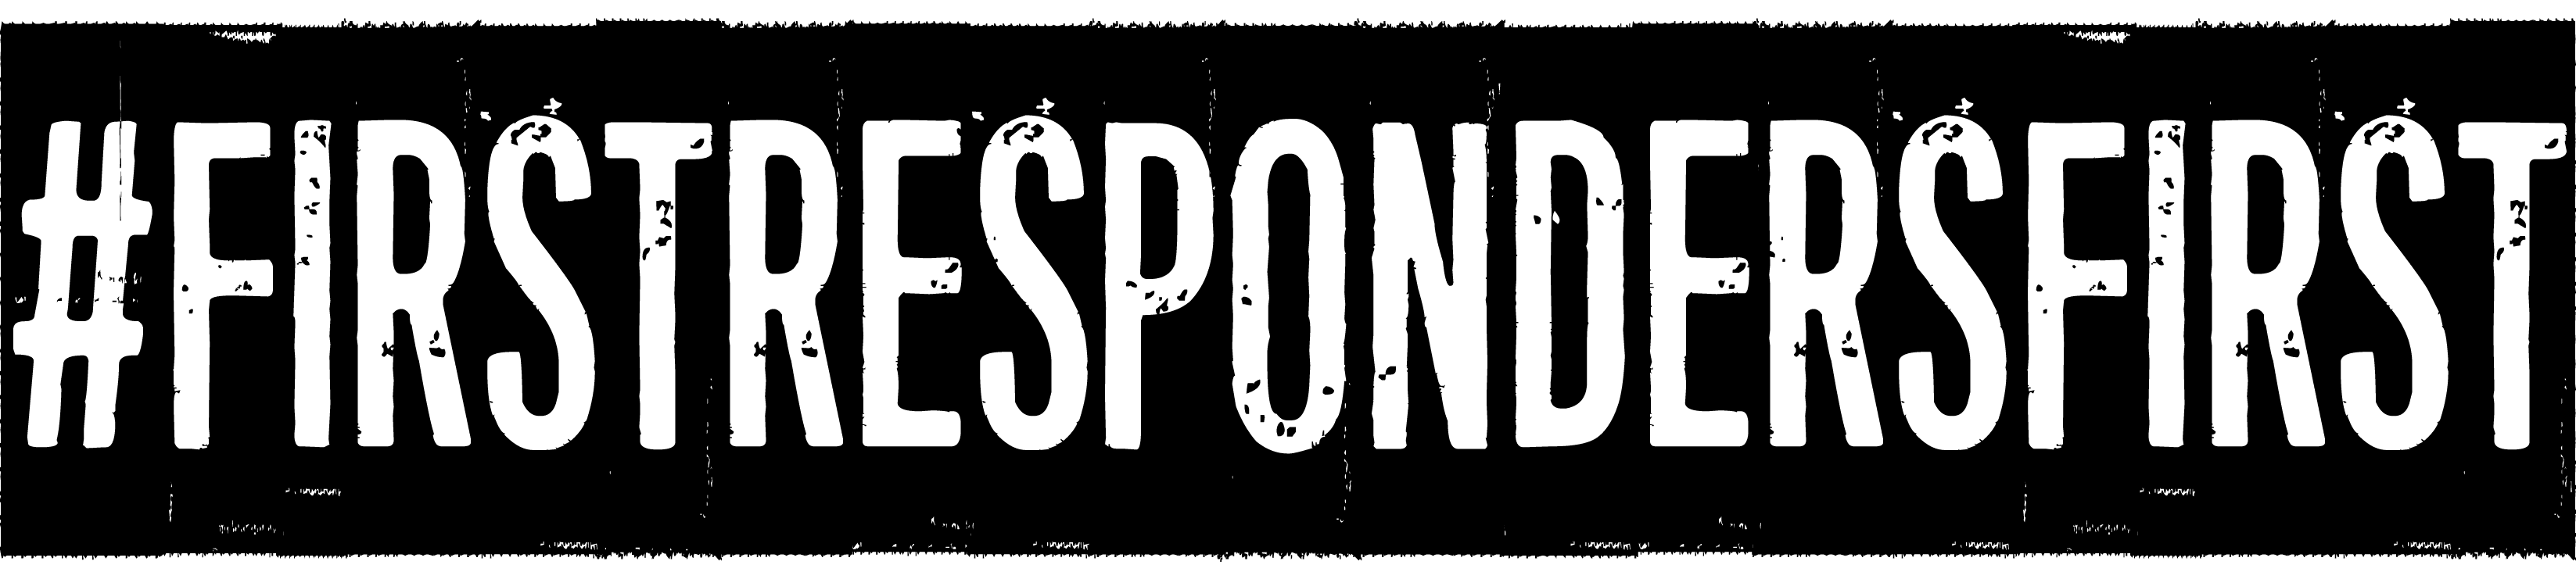 firstrespondersfirst logo